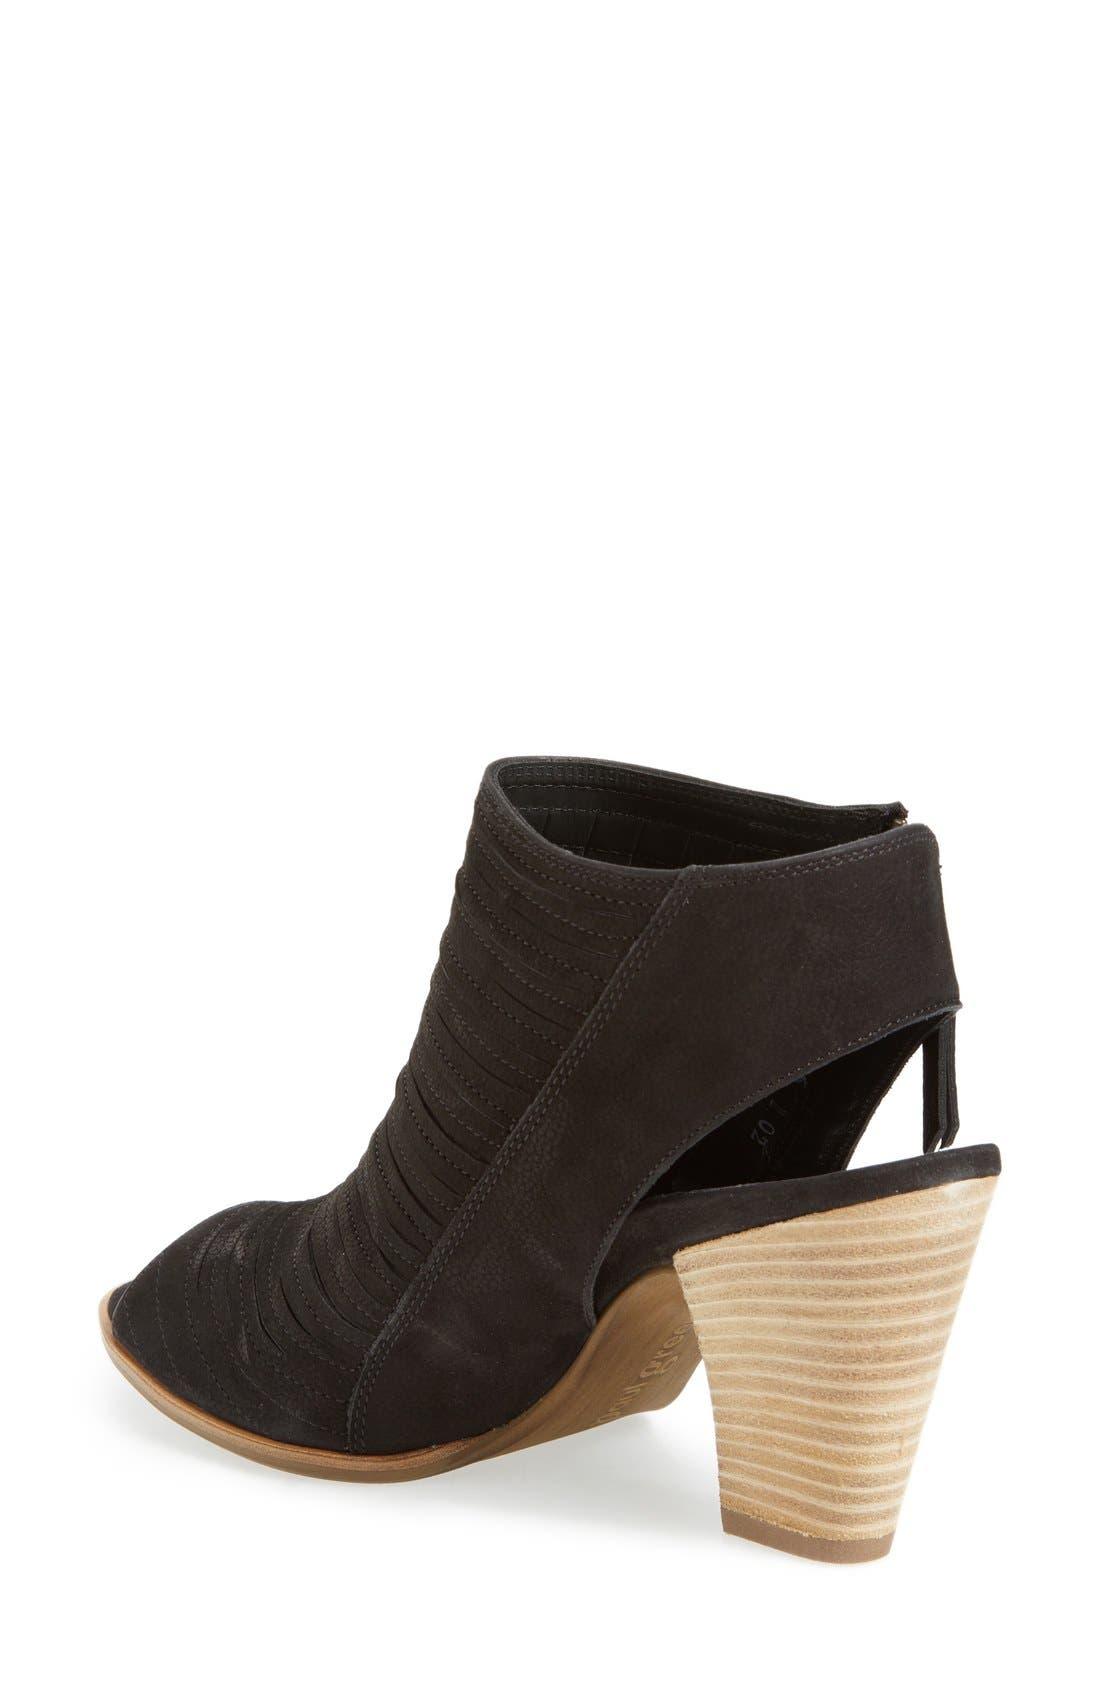 Alternate Image 2  - Paul Green 'Cayanne' Leather Peep Toe Sandal (Women)